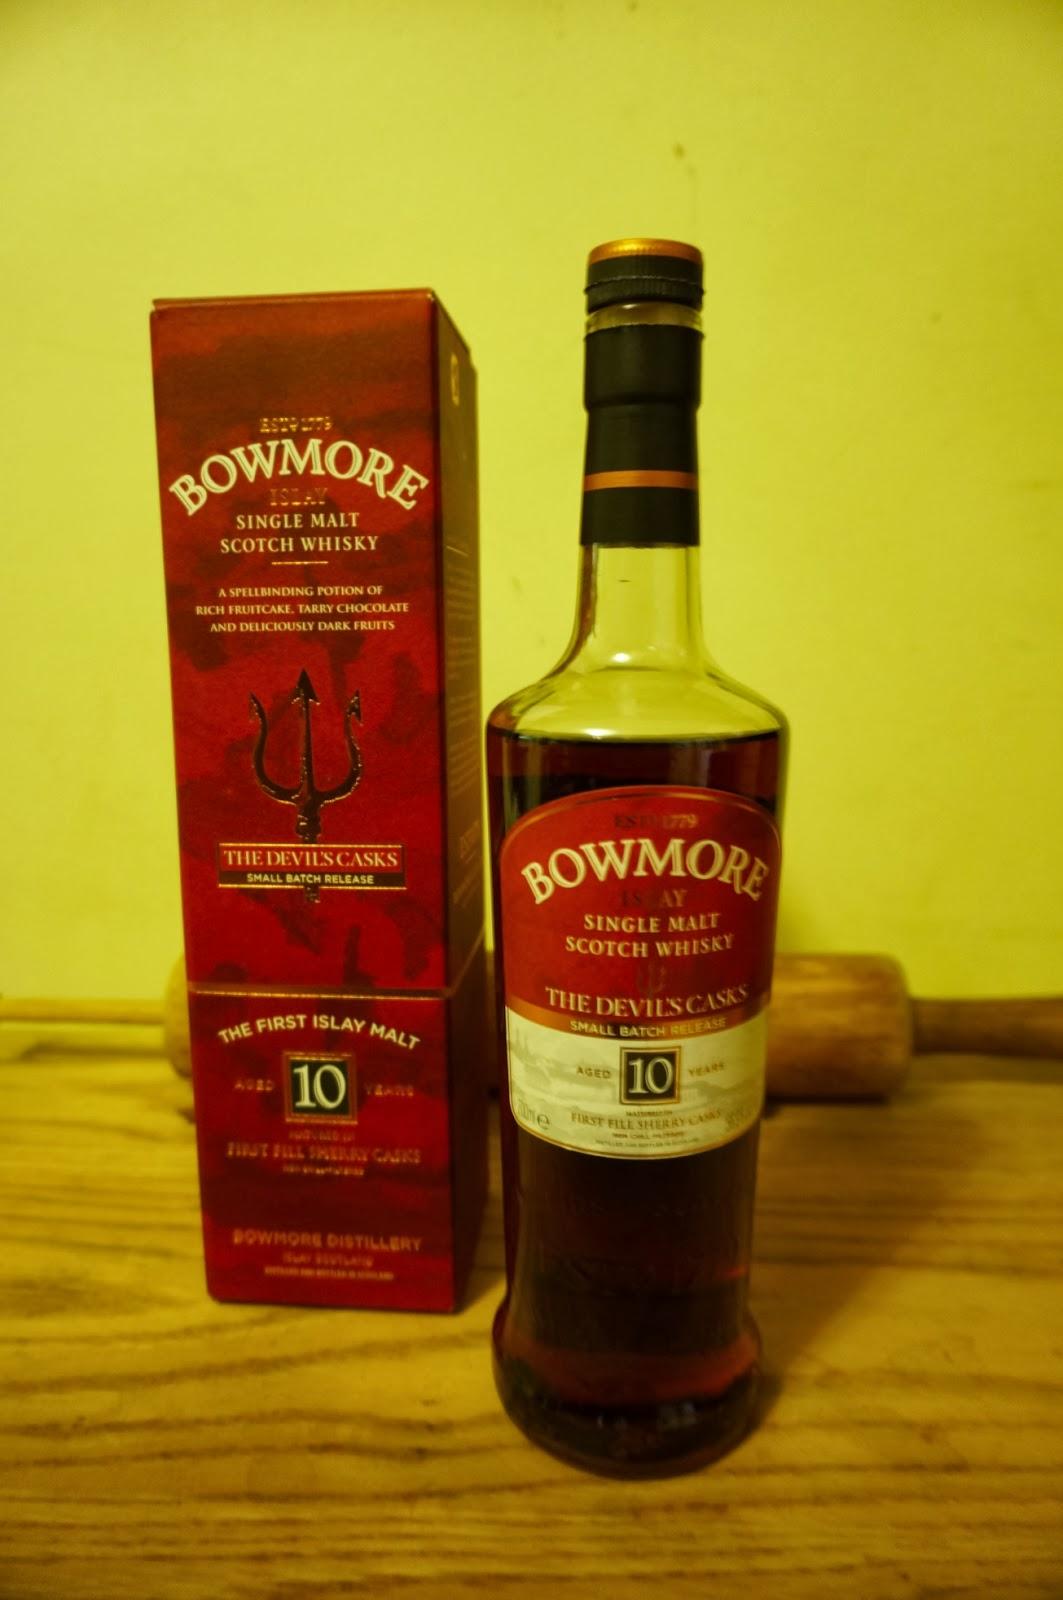 oberhausen wohnung milder single malt single  Milder single malt whiskey - Navy Present. Milder single malt whiskey - Navy Present.